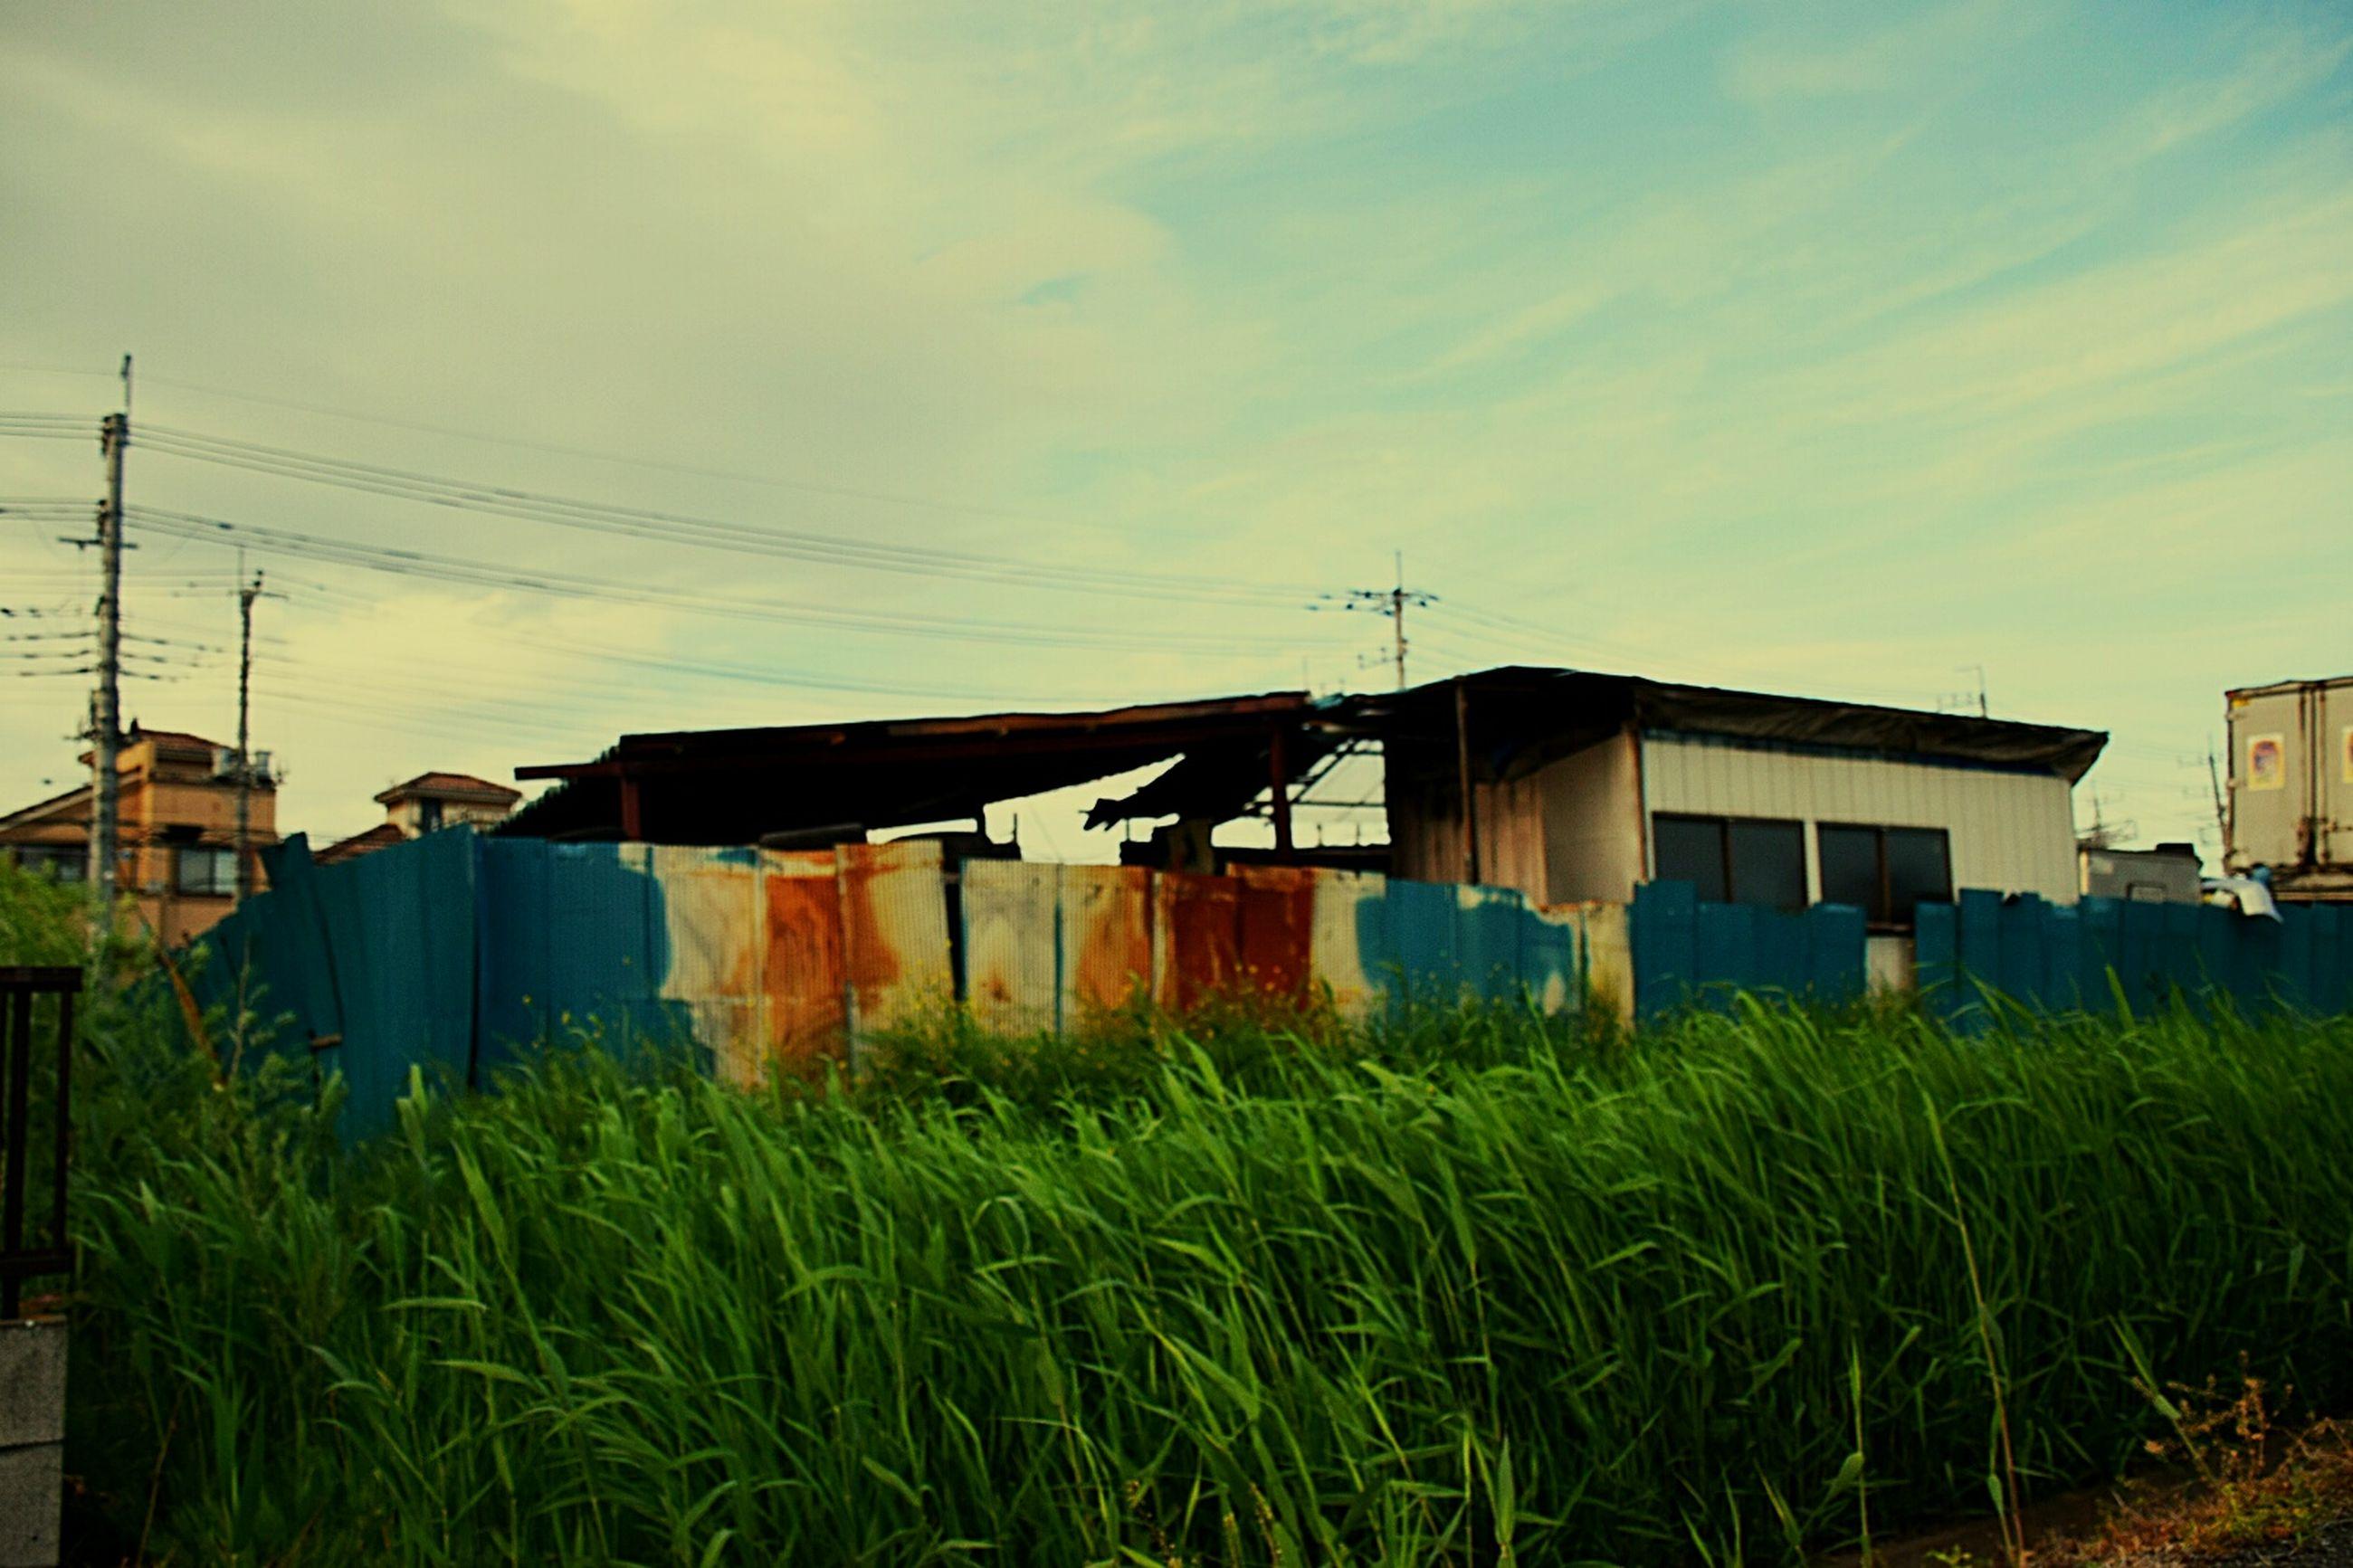 building exterior, built structure, sky, architecture, field, grass, house, rural scene, power line, farm, electricity pylon, agriculture, growth, cloud - sky, plant, green color, cloud, nature, no people, cable